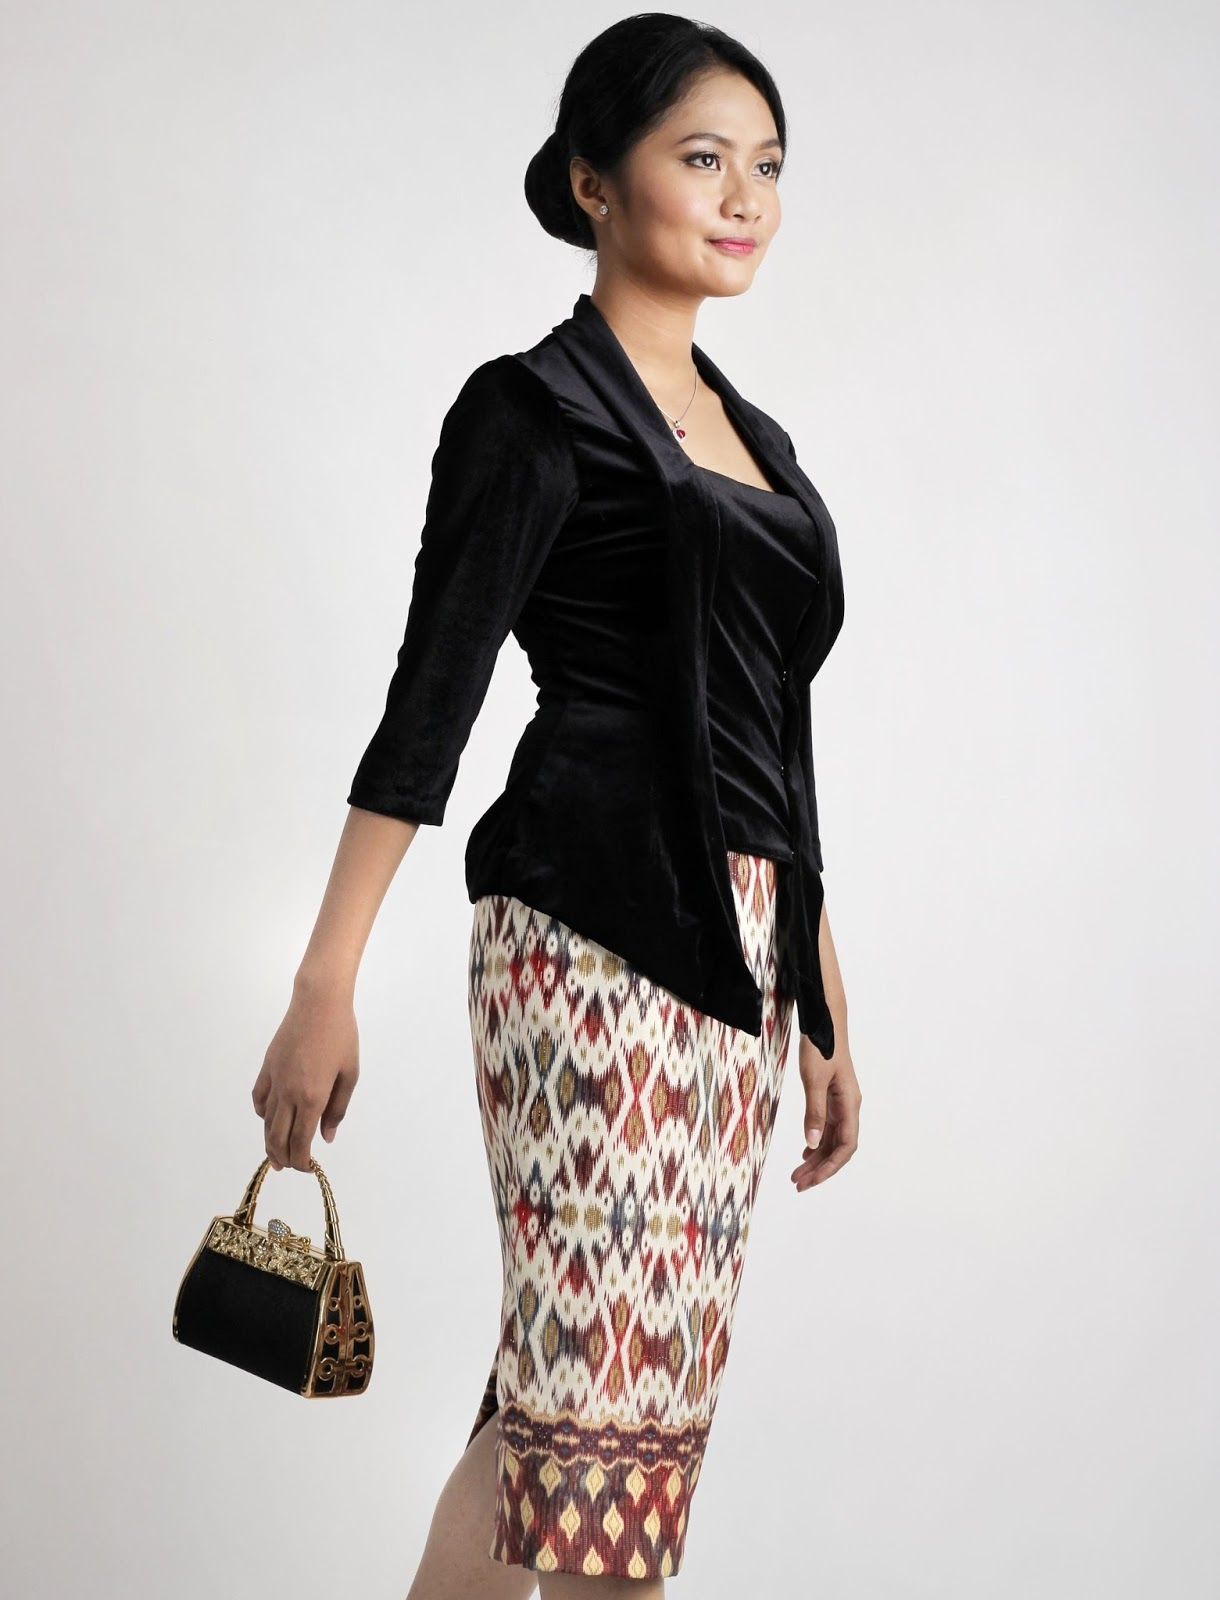 Model Kebaya Kutu Baru Hitam Modern Cantik dan Elegan